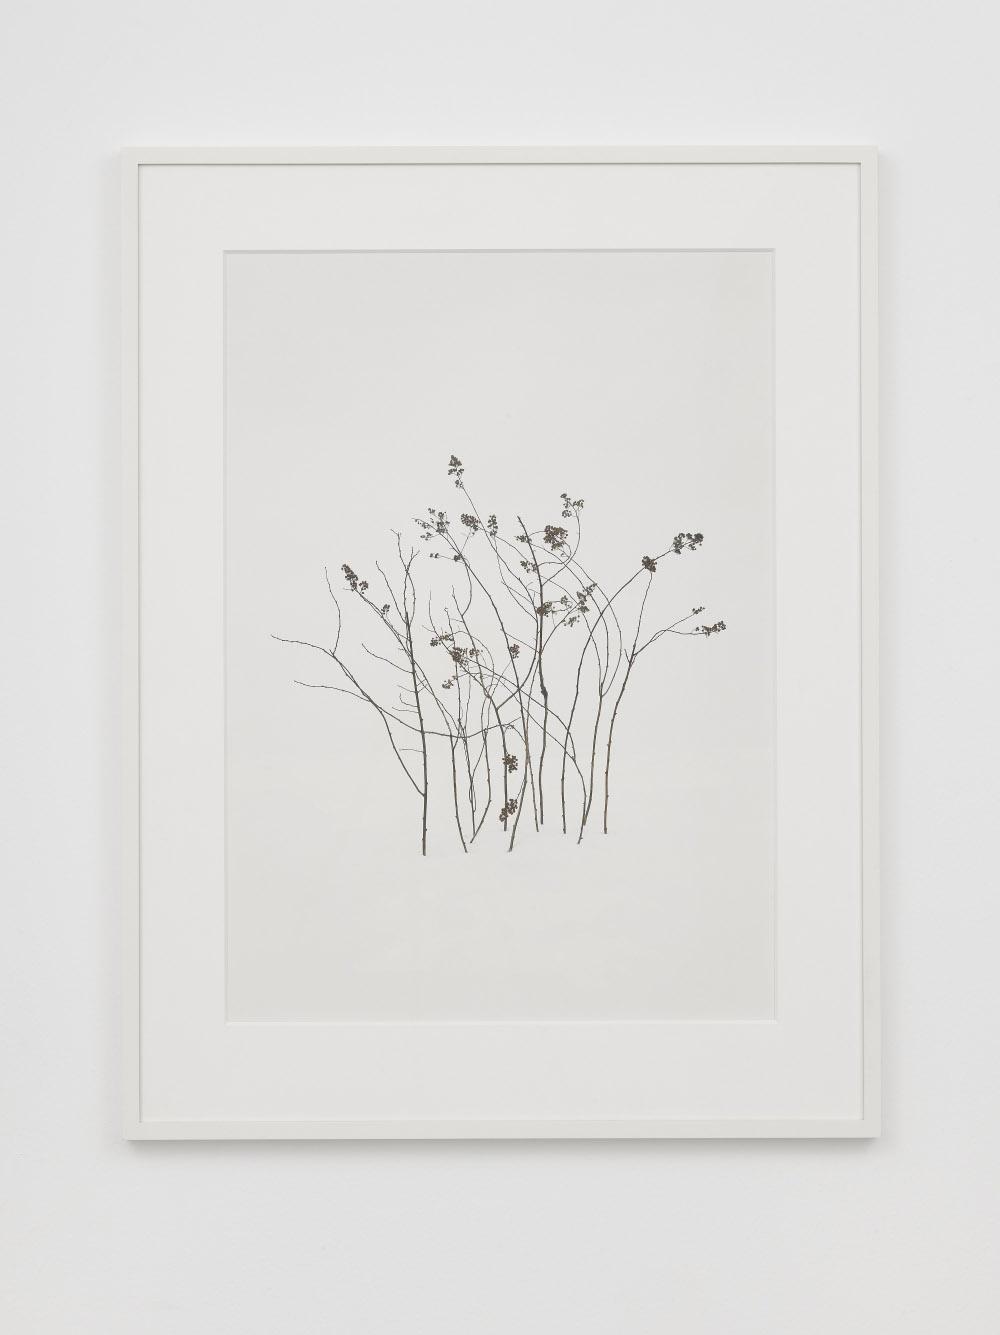 Untitled 8, 2014, digital fine art pigment print,Framed dims. 109.22 x 83.82 x 3.49 cm, Image dims. 85.6 x 61 cm